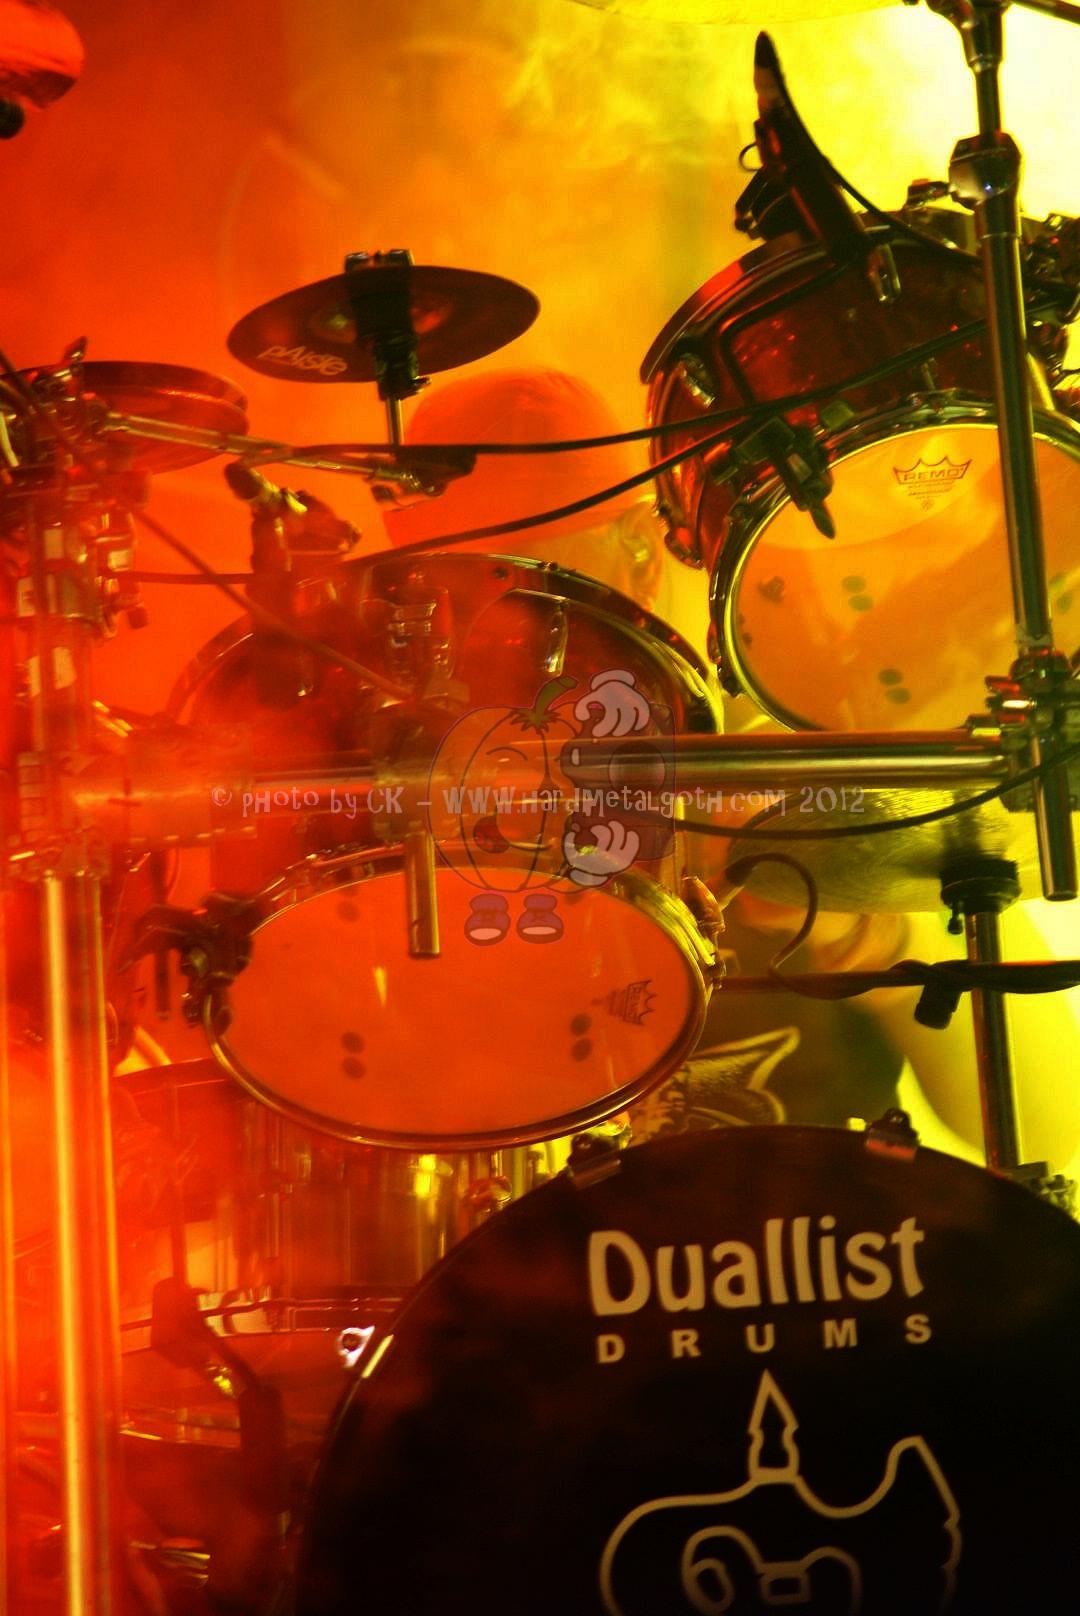 MetalxmasfestSaxon13.jpg